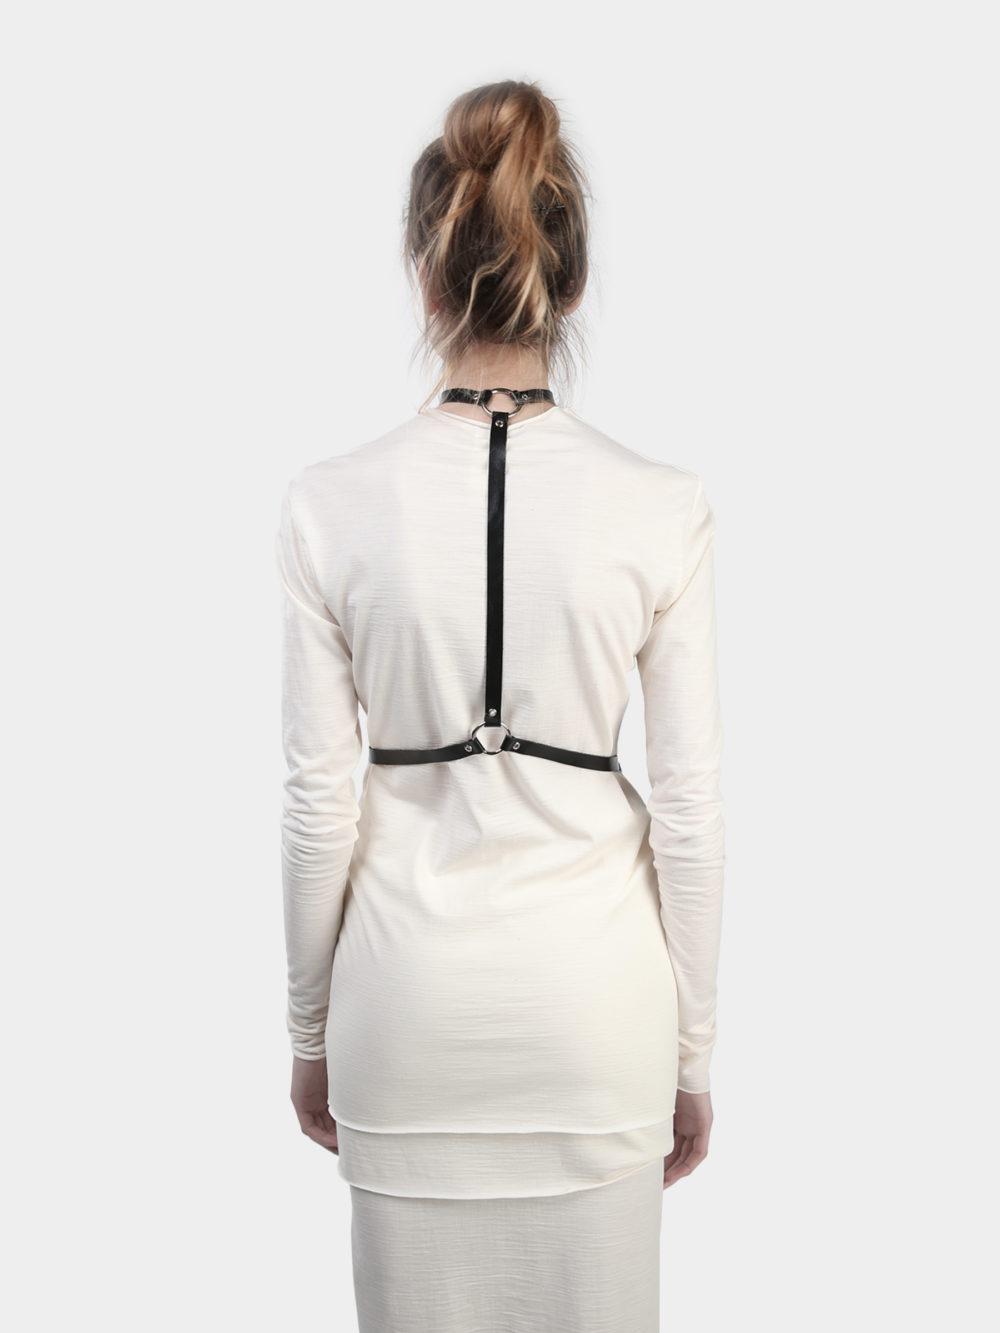 Ida Tau Leather Accessories - available at utopiast.com